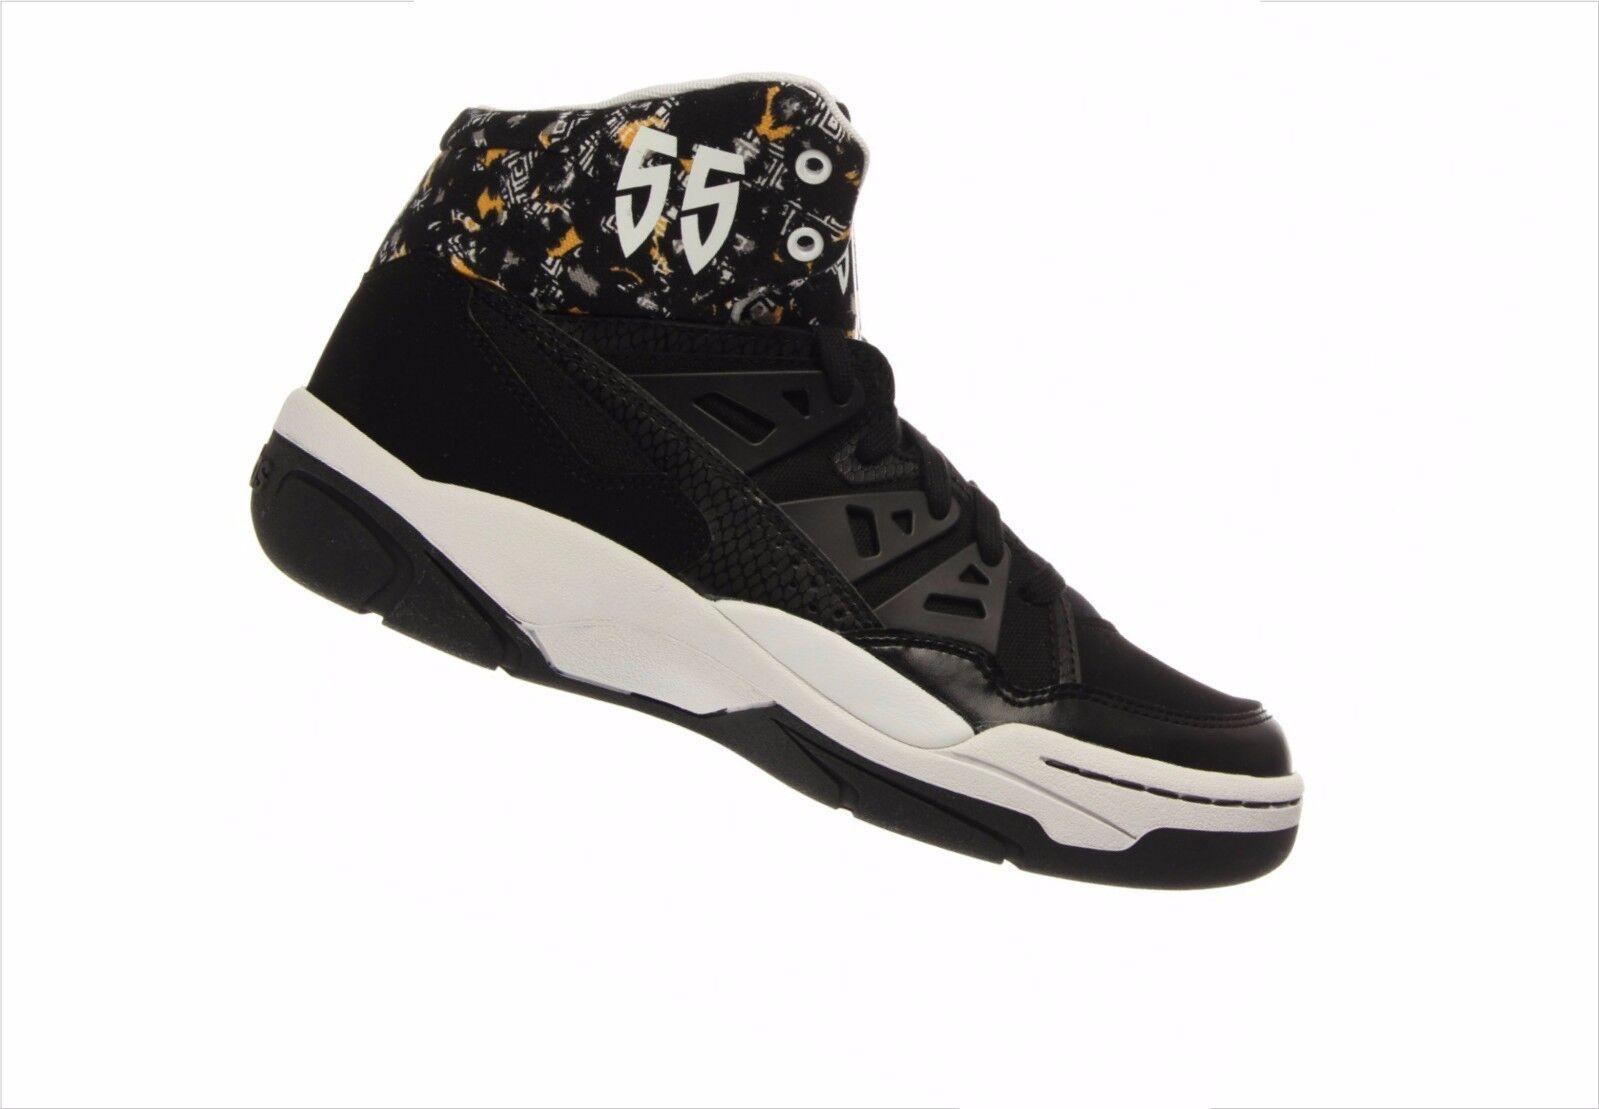 Men's Adidas Mutumbo Black/White - Casual Mid-Tops Basketball - Black/White C75208 a1b194